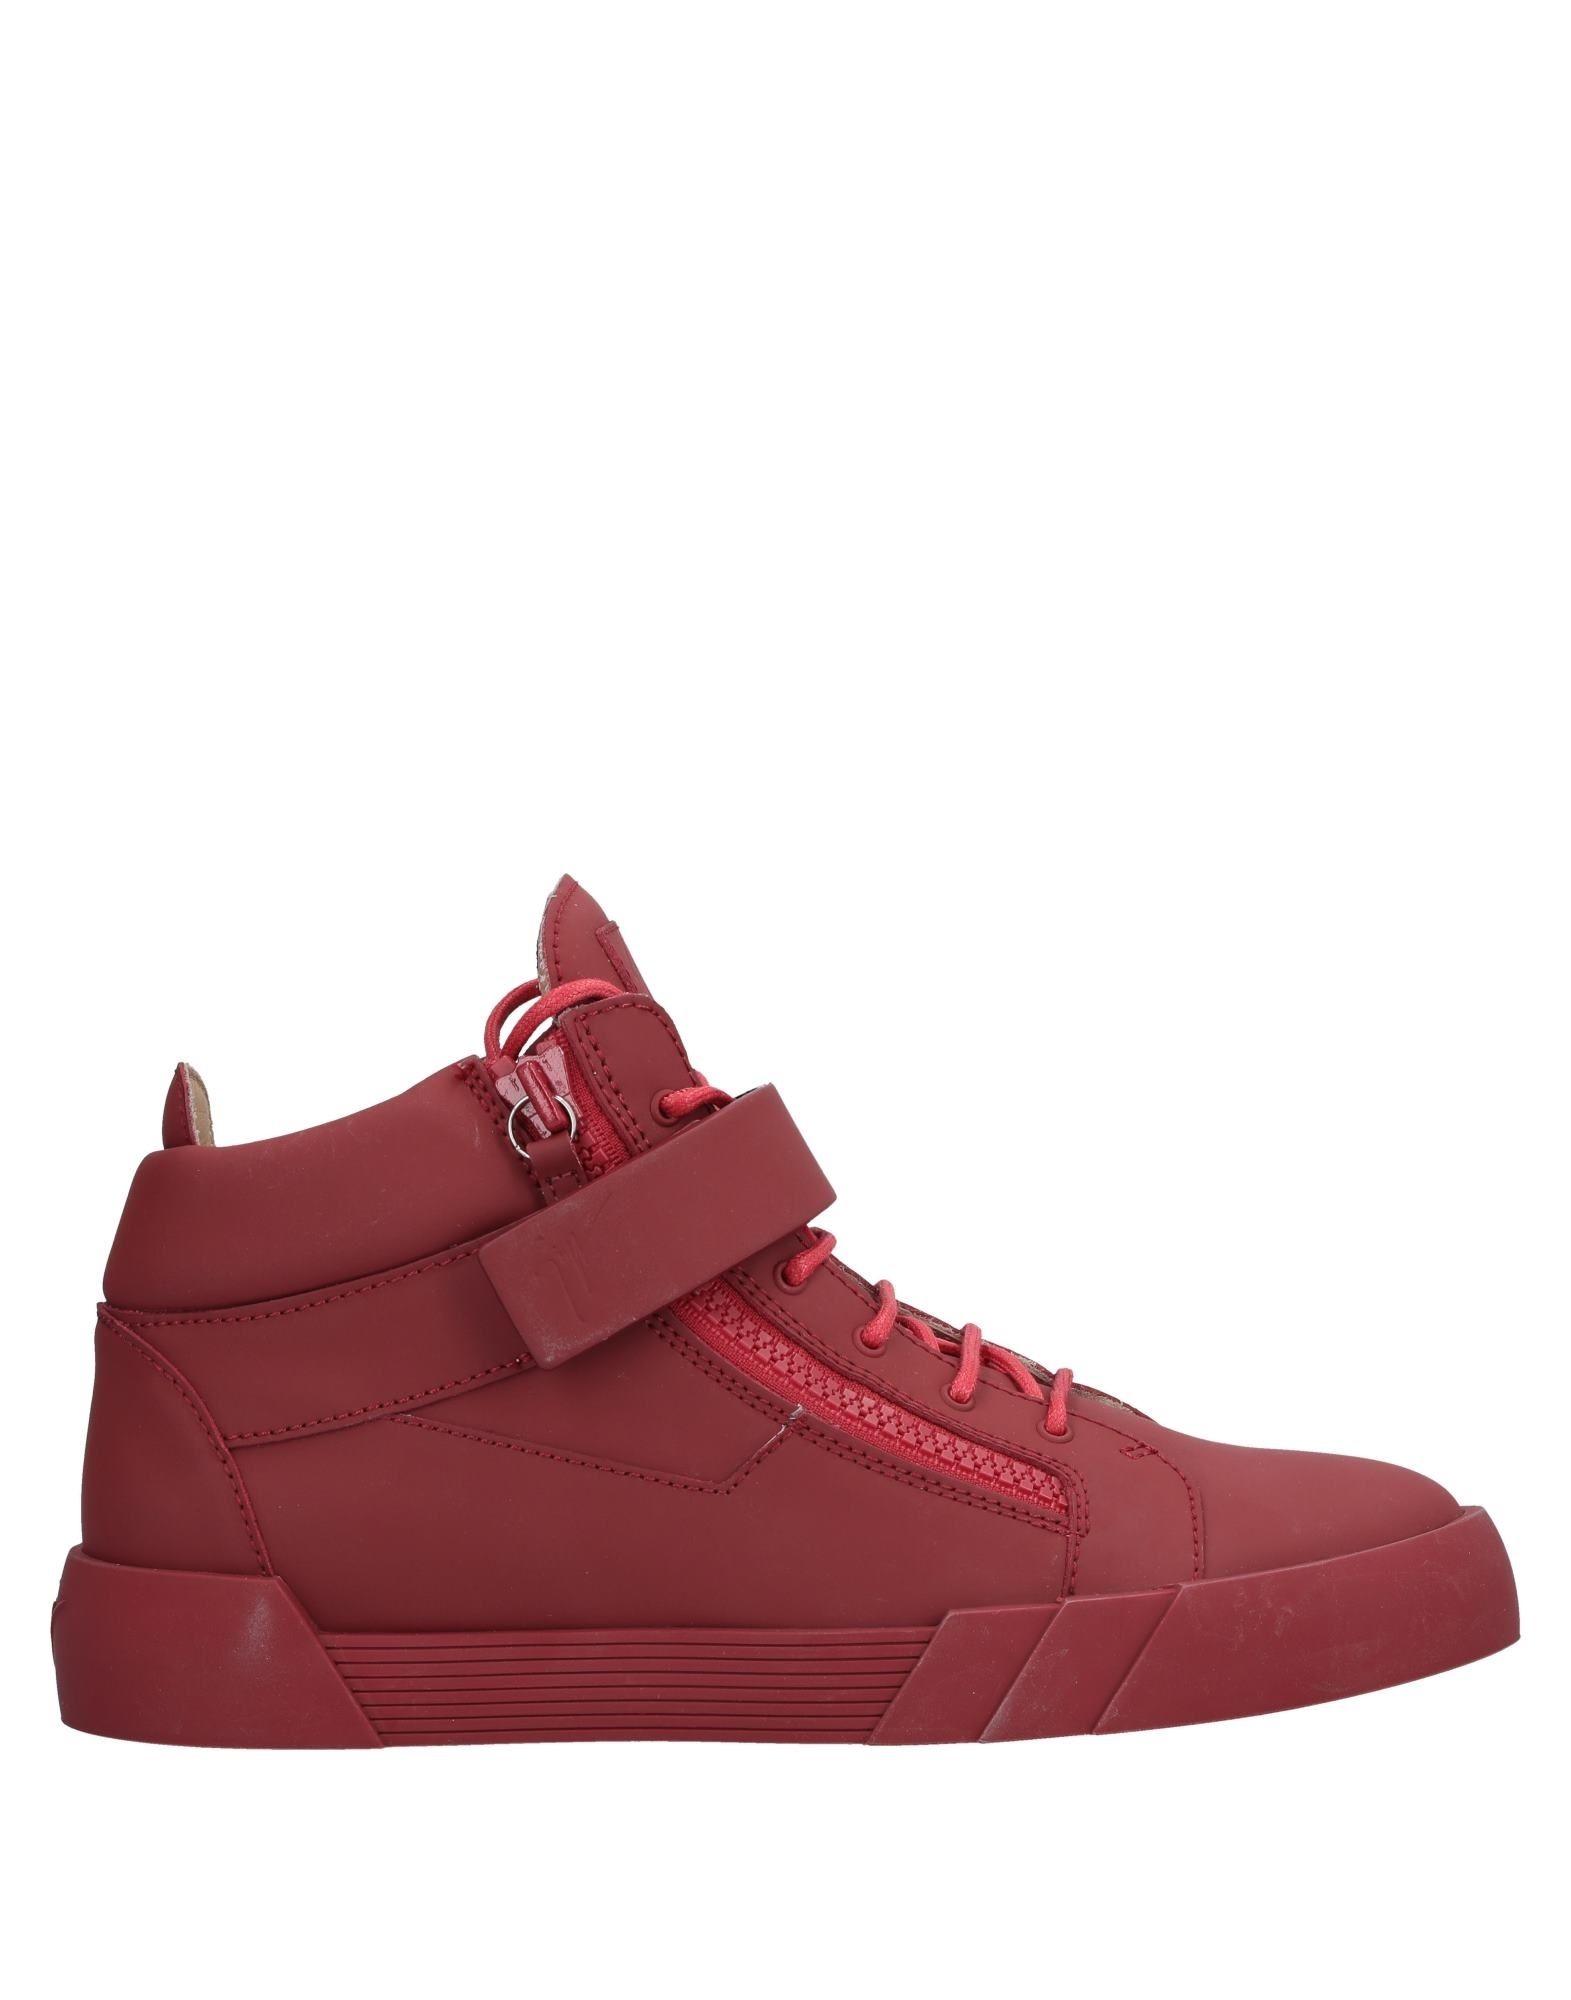 Giuseppe Zanotti Sneakers Herren  11209068WO Gute Qualität beliebte Schuhe